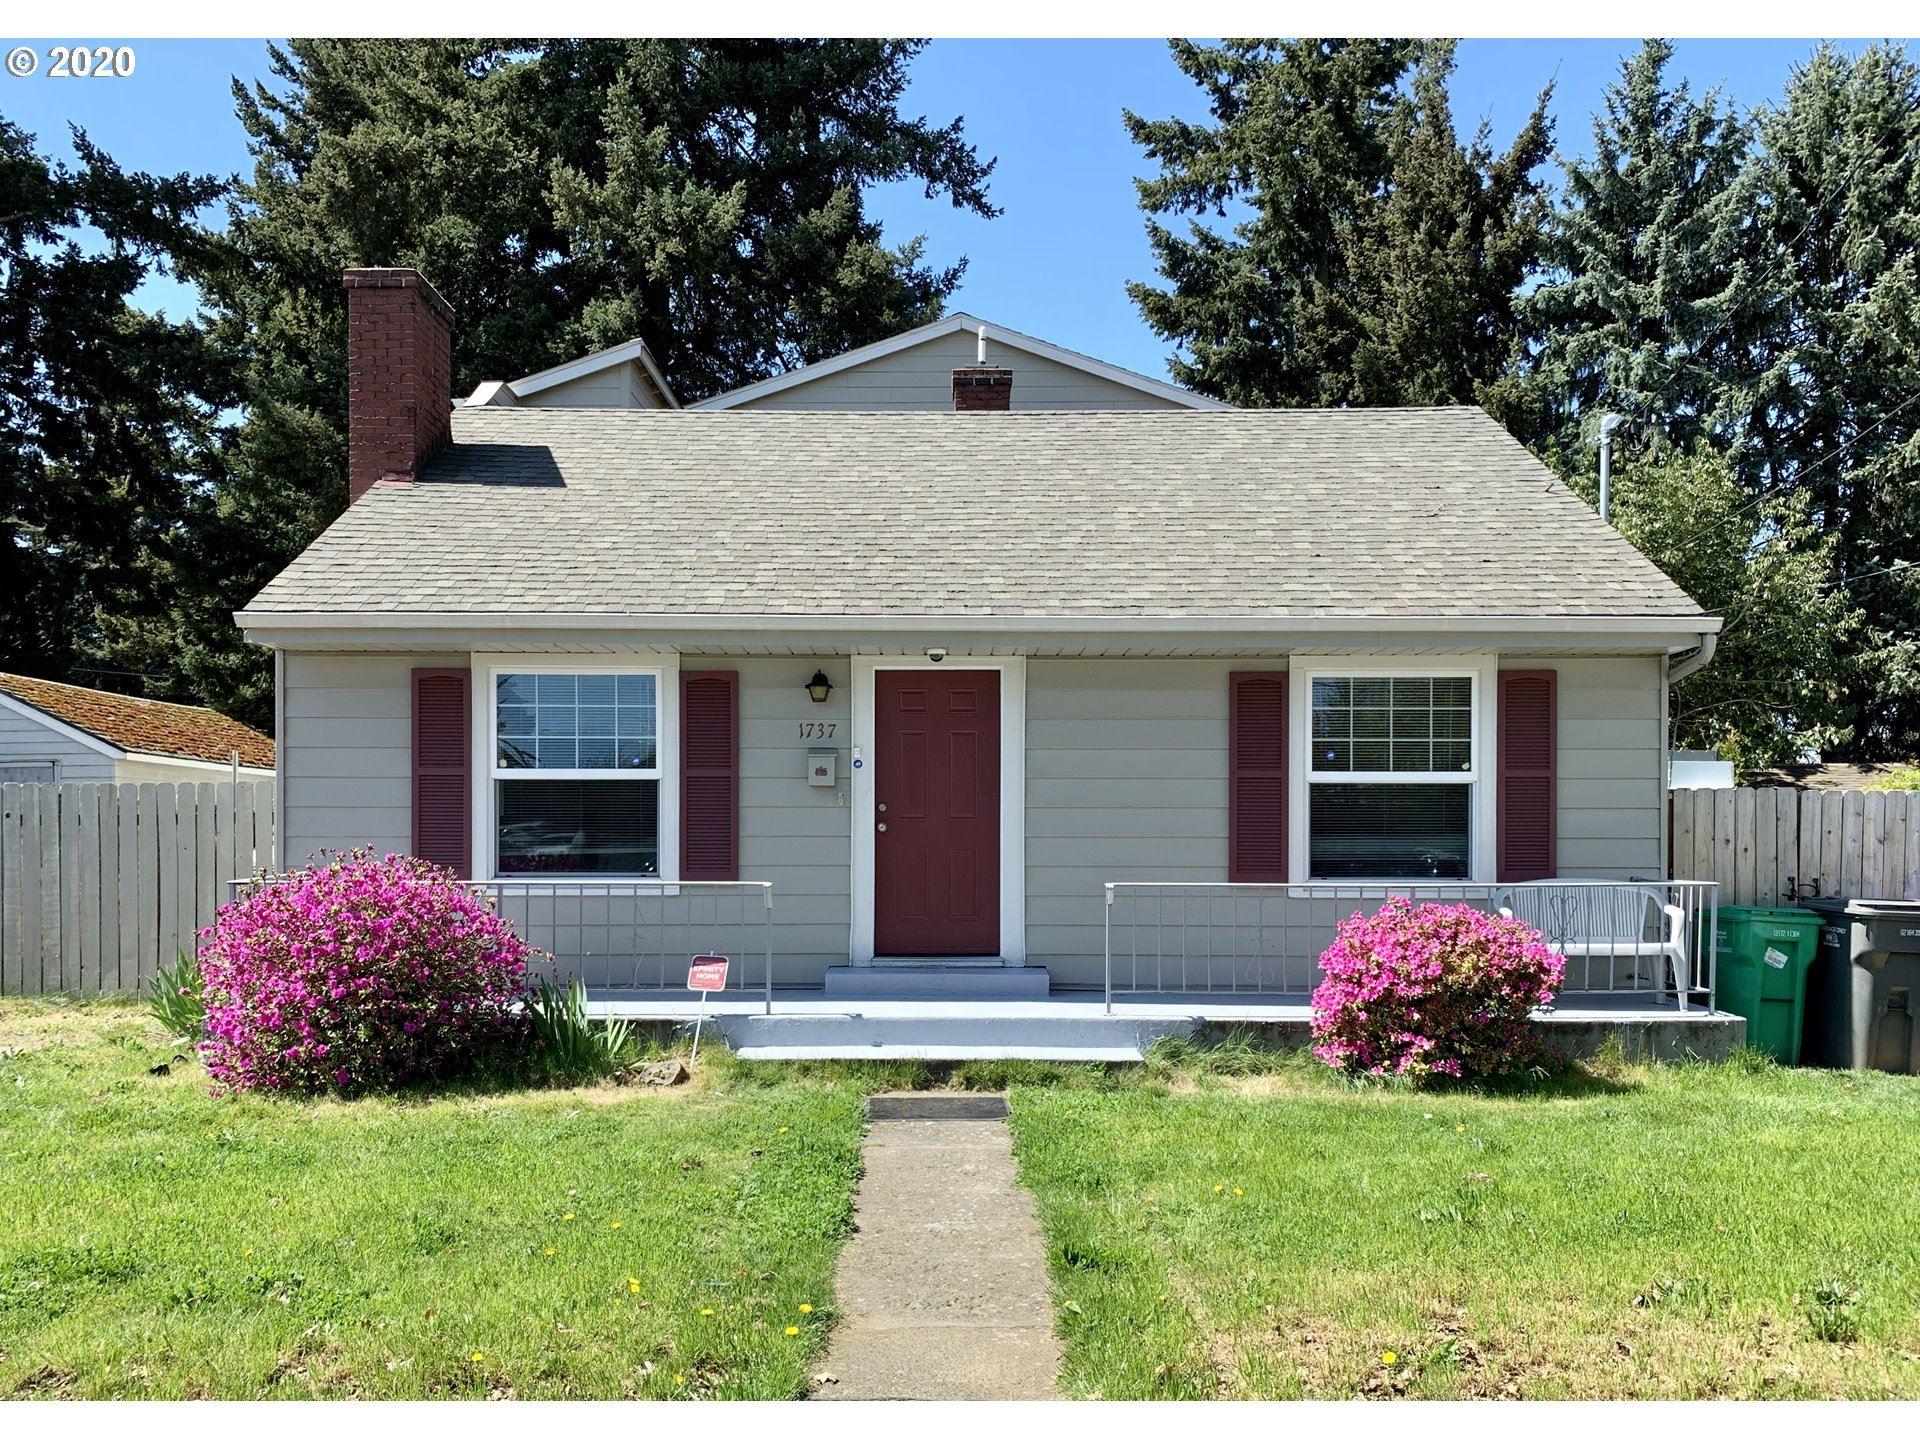 1737 NE 102ND AVE, Portland, OR 97220 - MLS#: 20555621